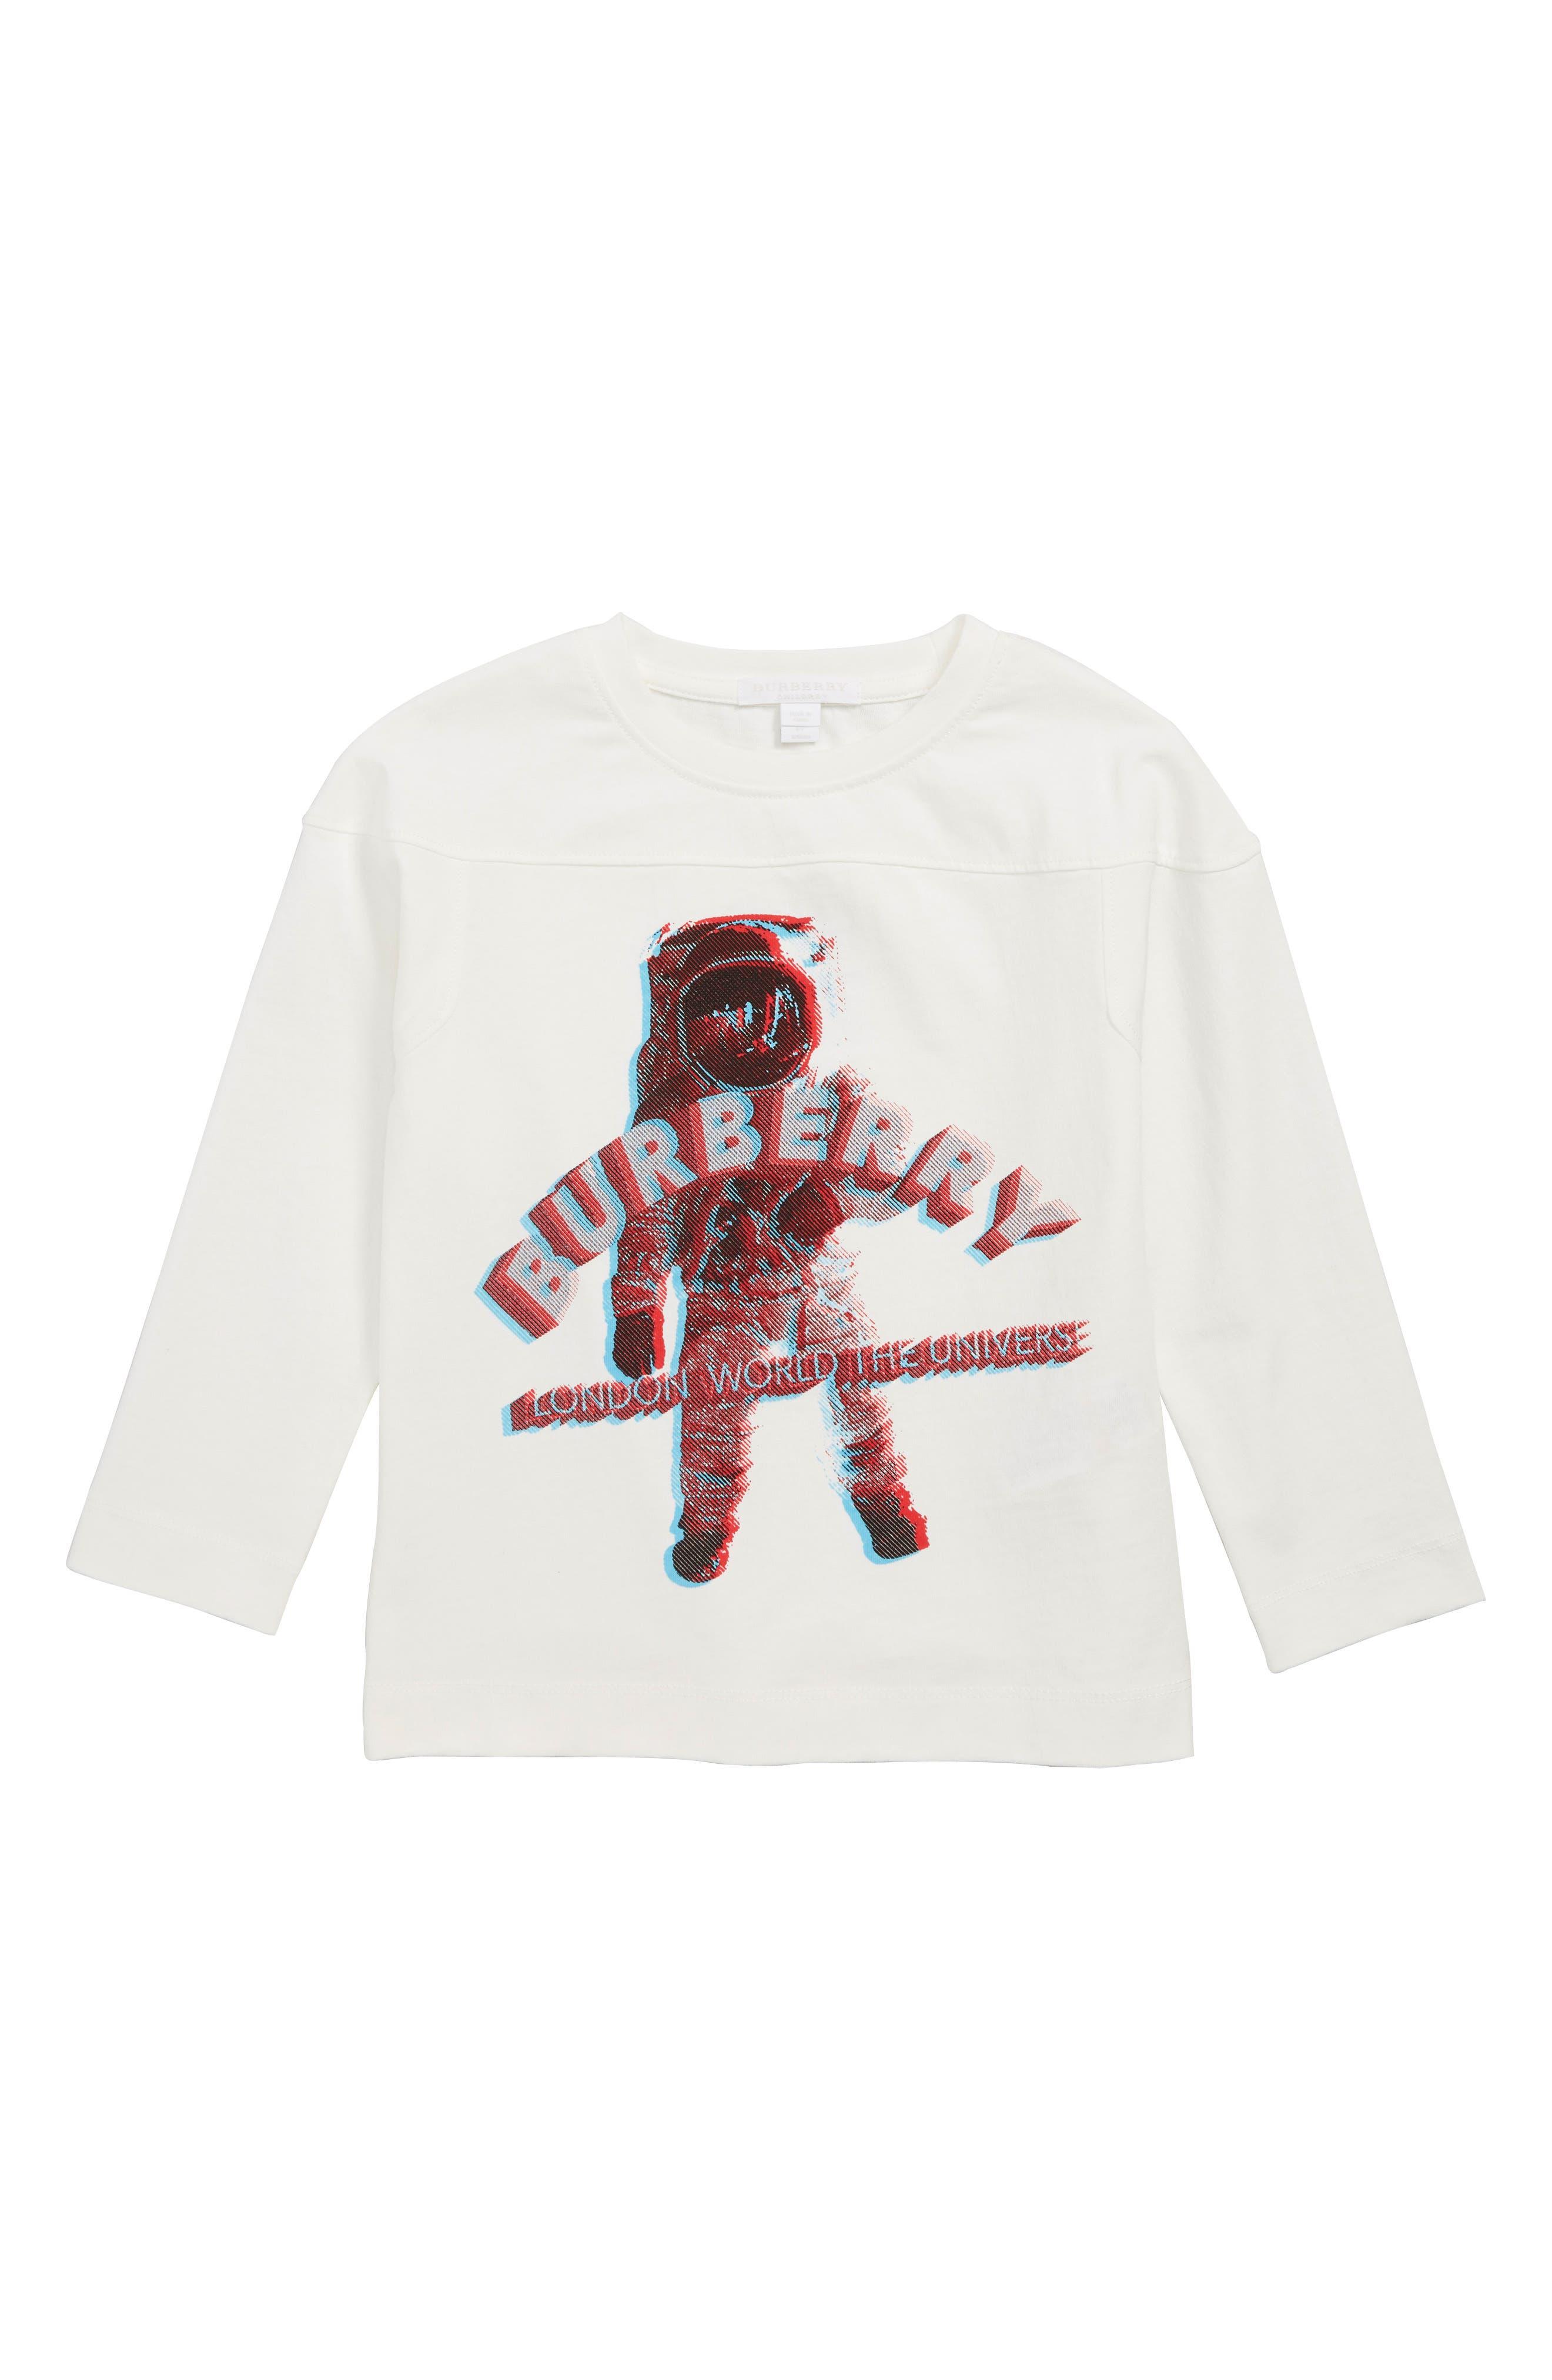 BURBERRY 3D Spaceman Graphic T-Shirt, Main, color, 100